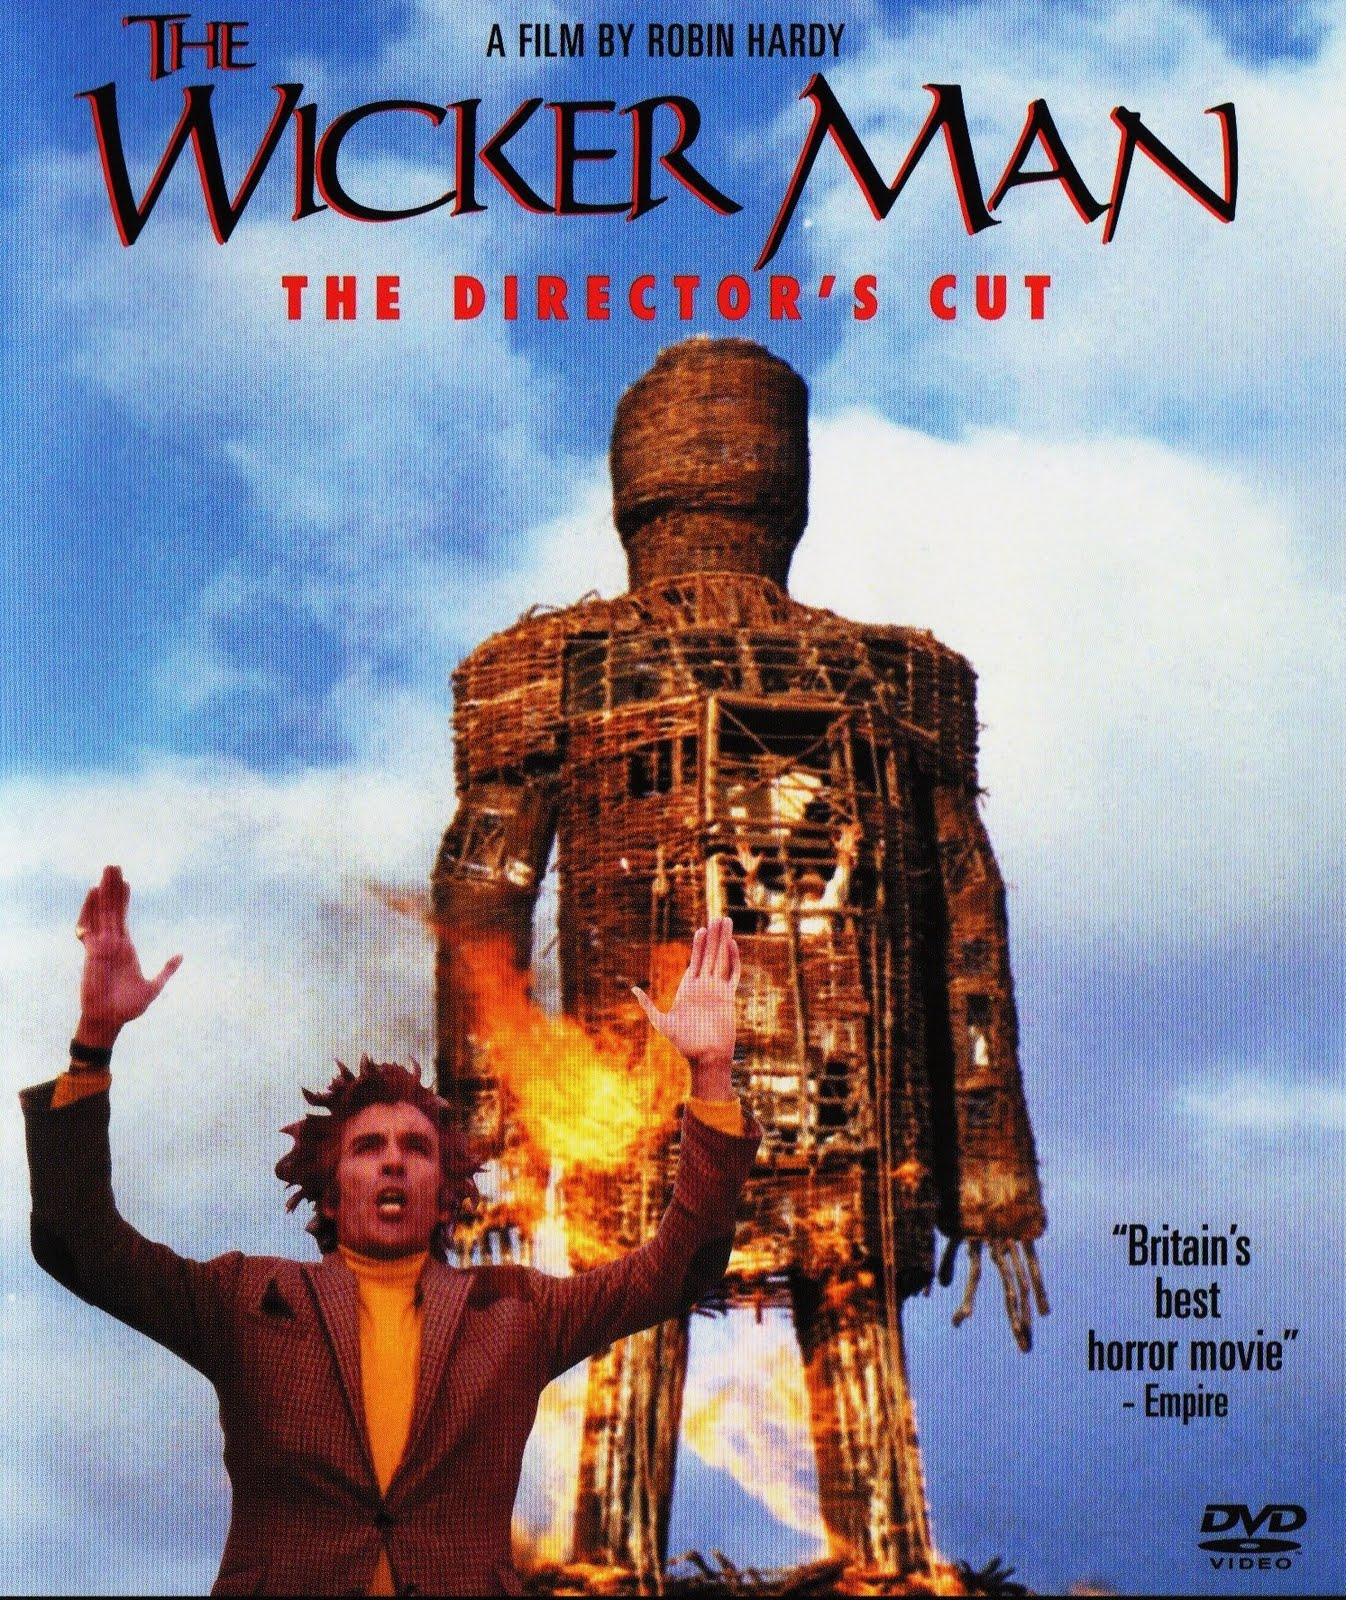 wicker man single Band : iron maiden country : great britain release : the wicker man (single) year : 2000 genre : heavy metal file info : mp3, 320 kbps, cds-rip, covers, wallpaper download : ][ ul.